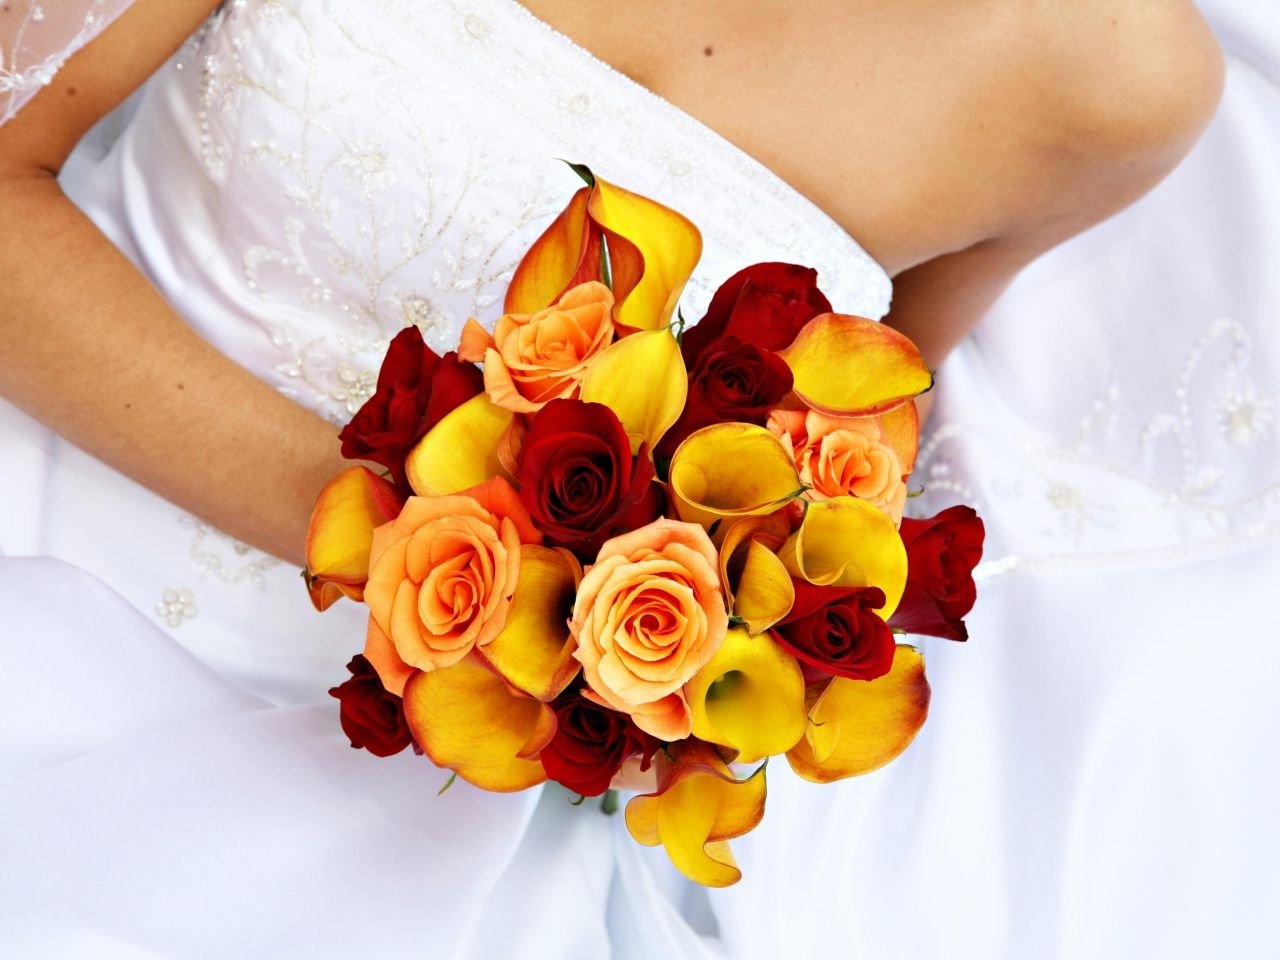 Calla Lilien Bilder Rosen Hintergrundbilder Brautigam Vektor